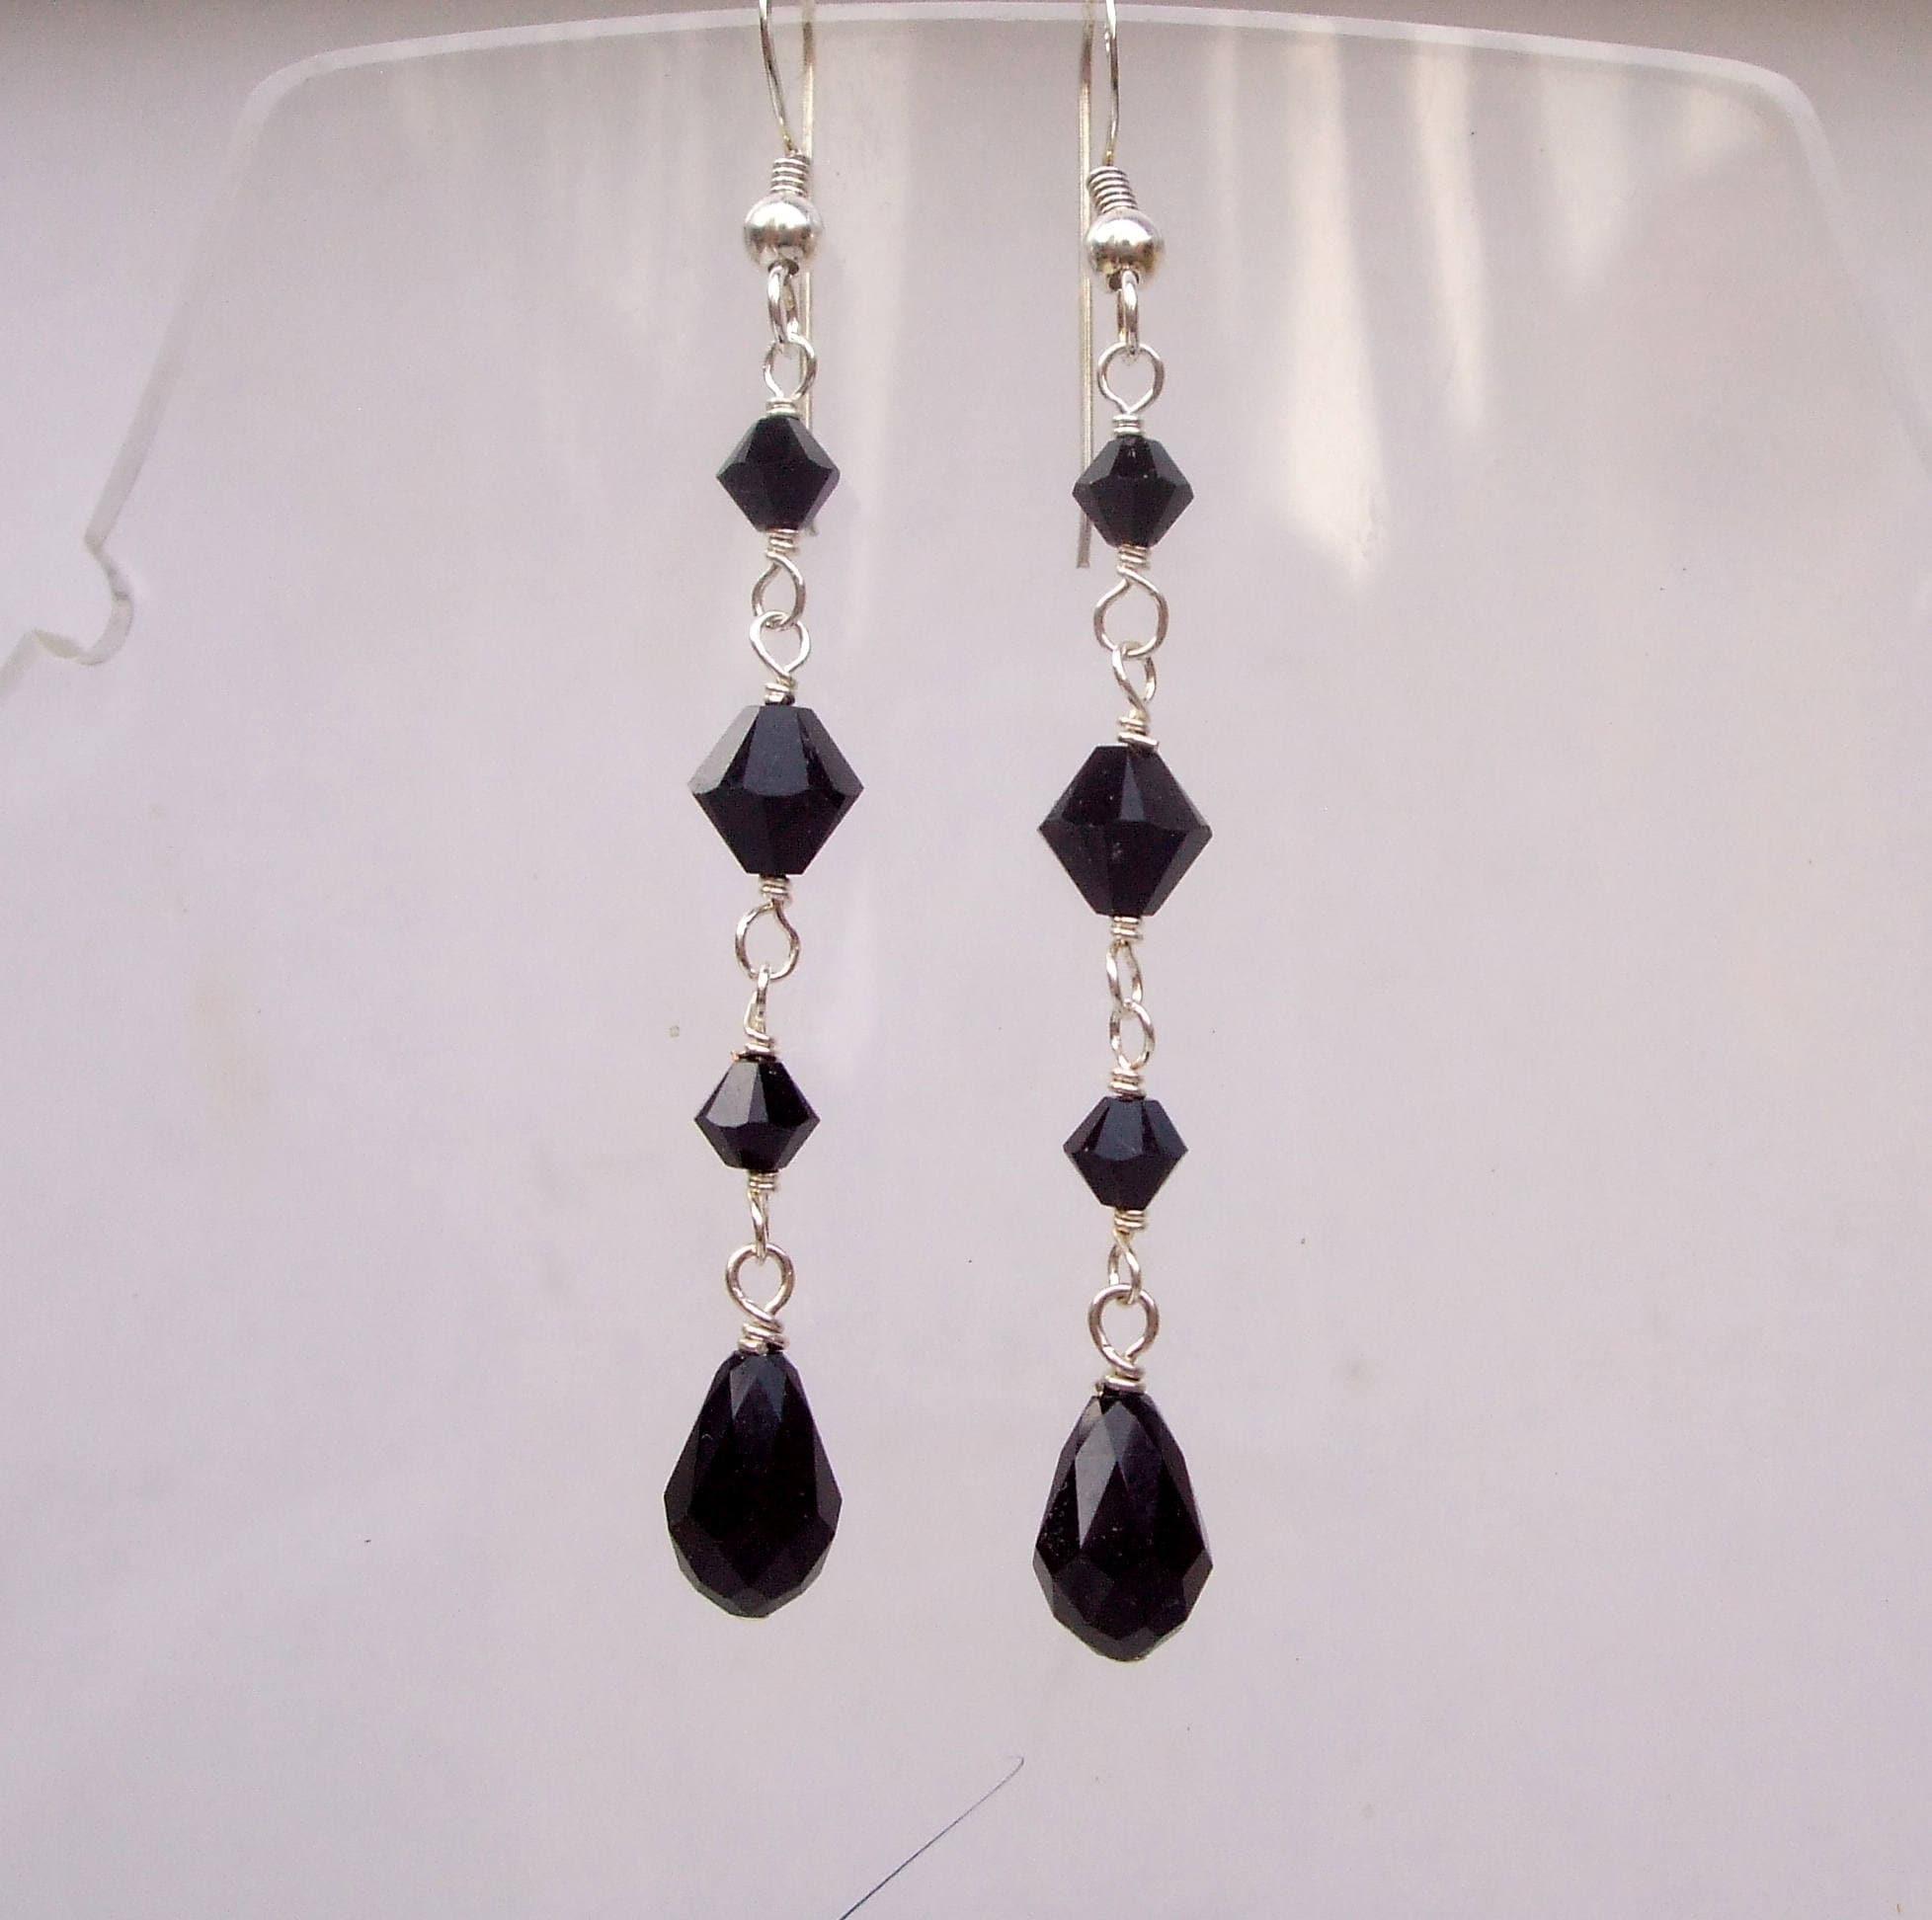 Long Black Swarovski Crystal Teardrop Earrings Sterling Silver Or Gold Hooks Leverbacks Studs